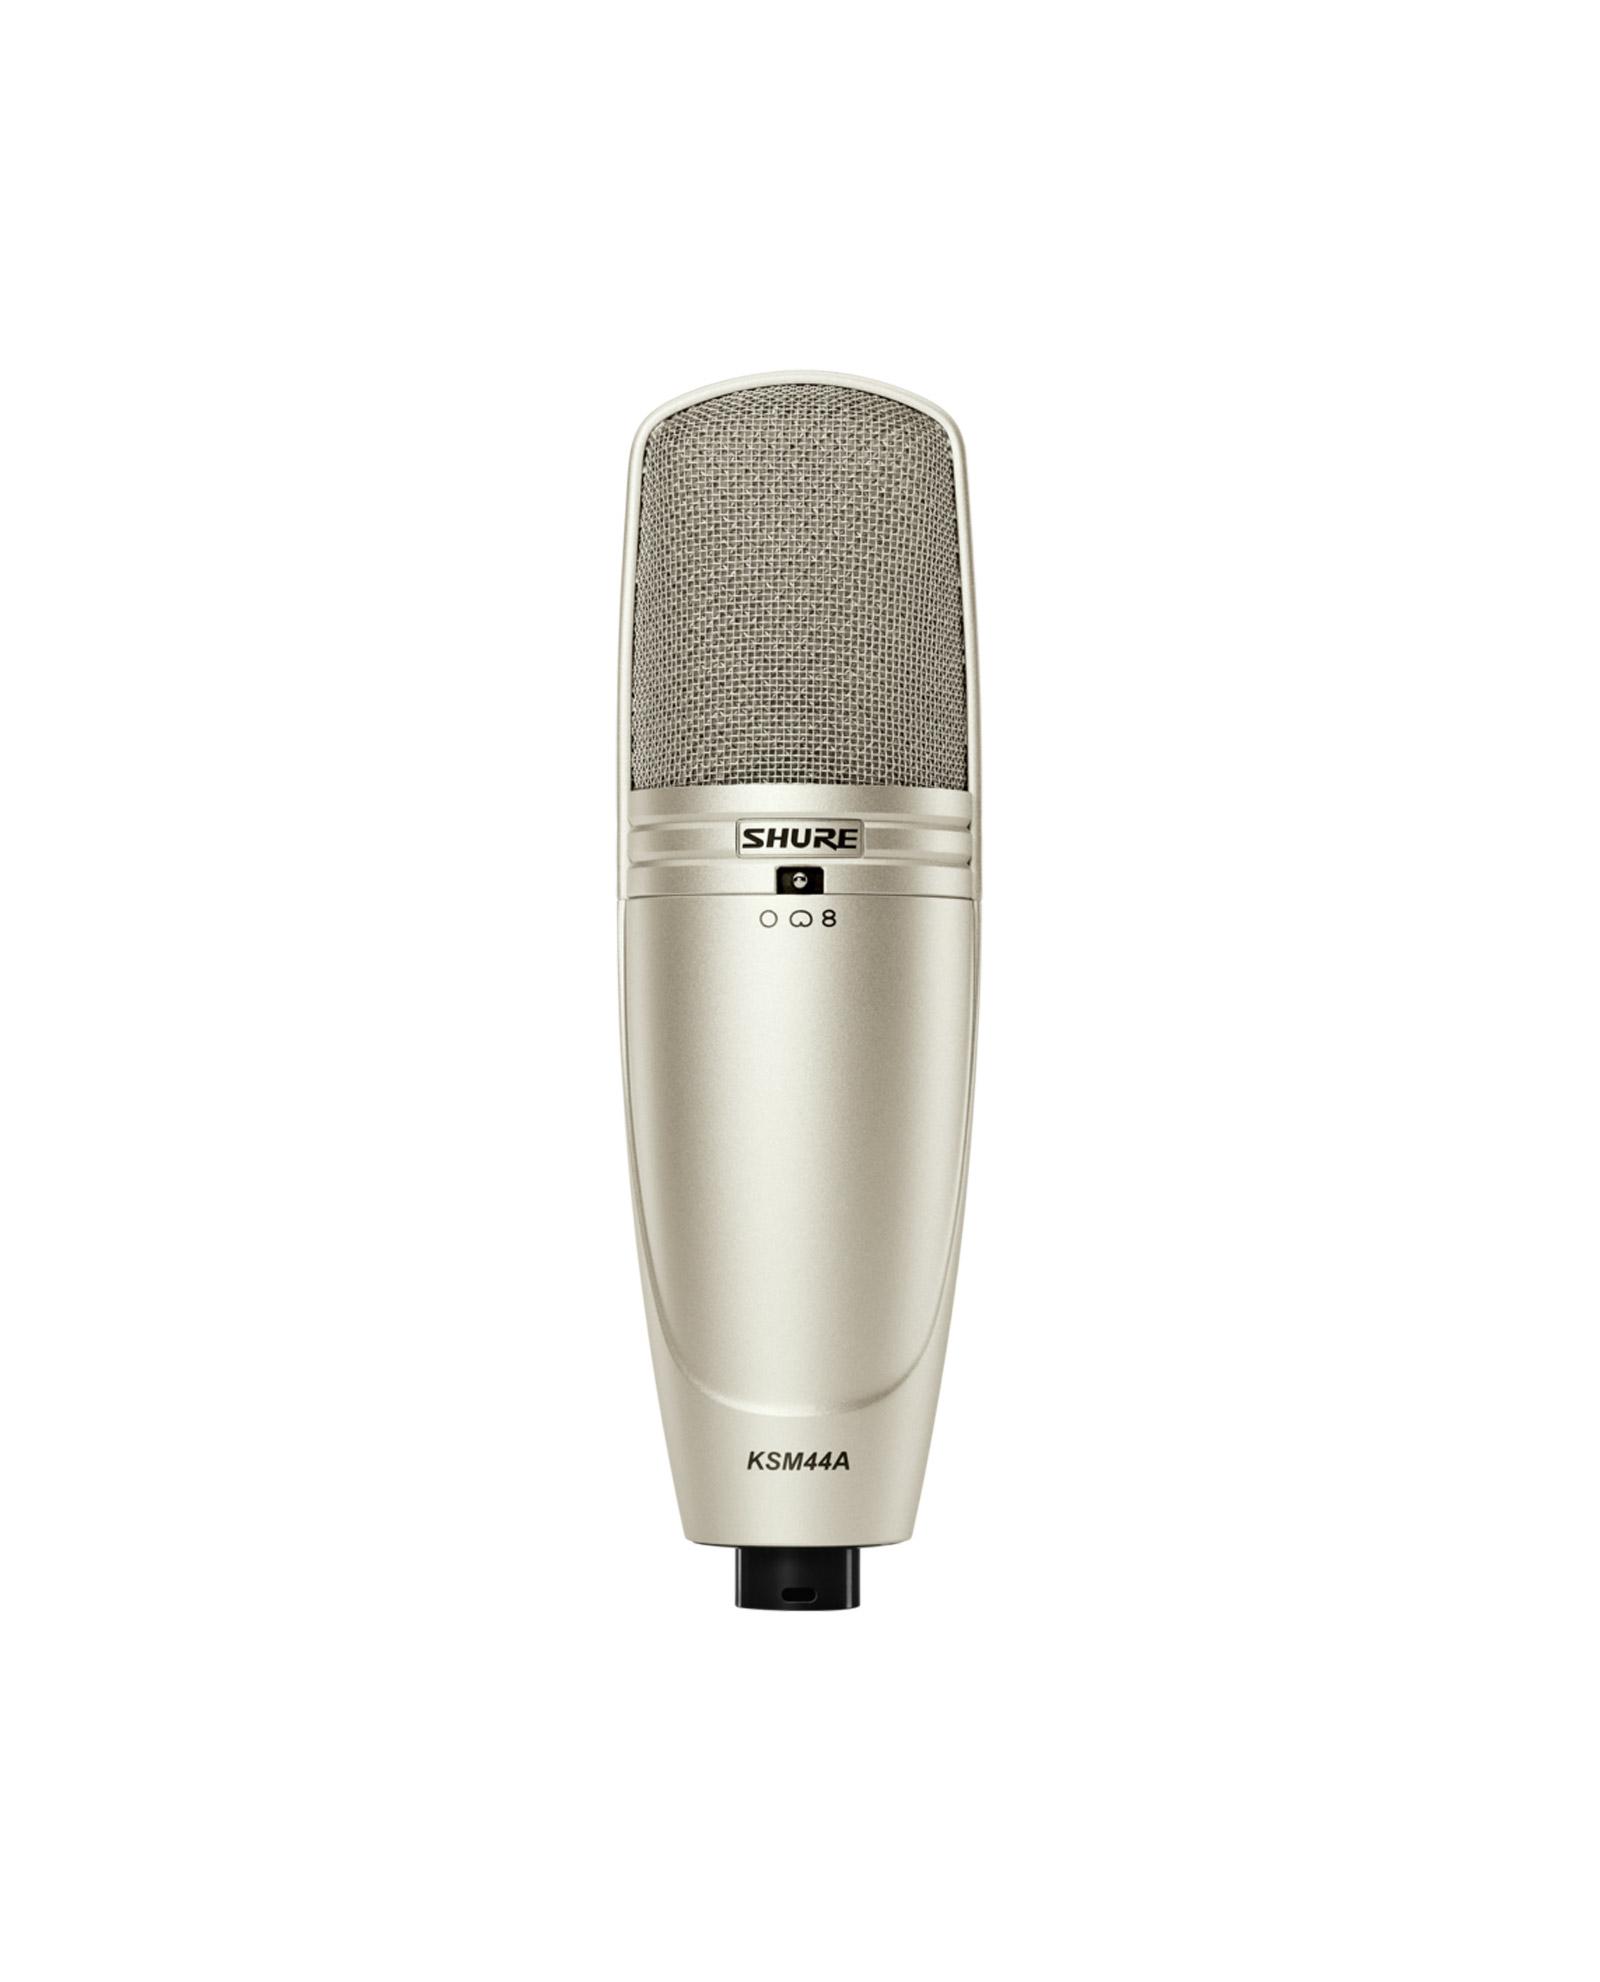 Shure Ksm44a Large Diaphragm Multi Pattern Condenser Microphone 1